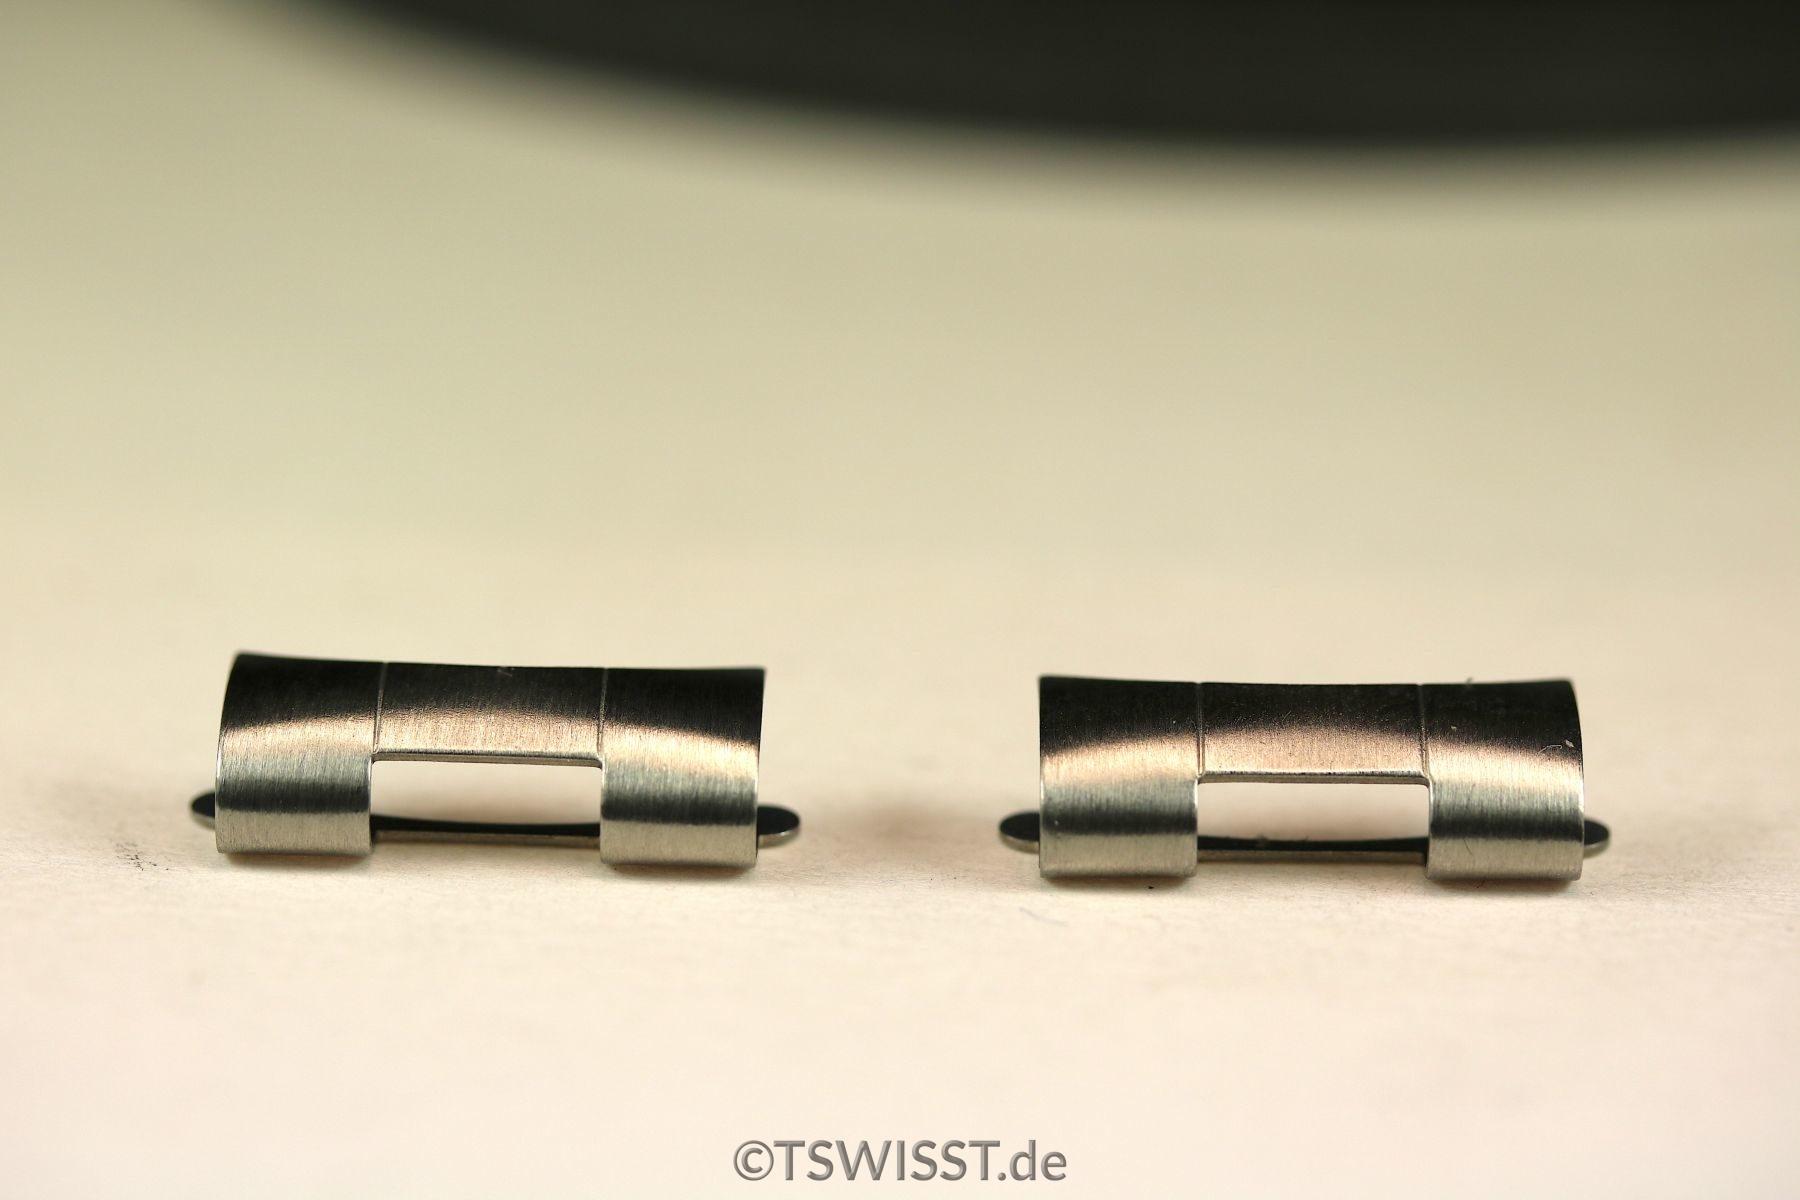 Rolex Endlink 384 (17 mm)